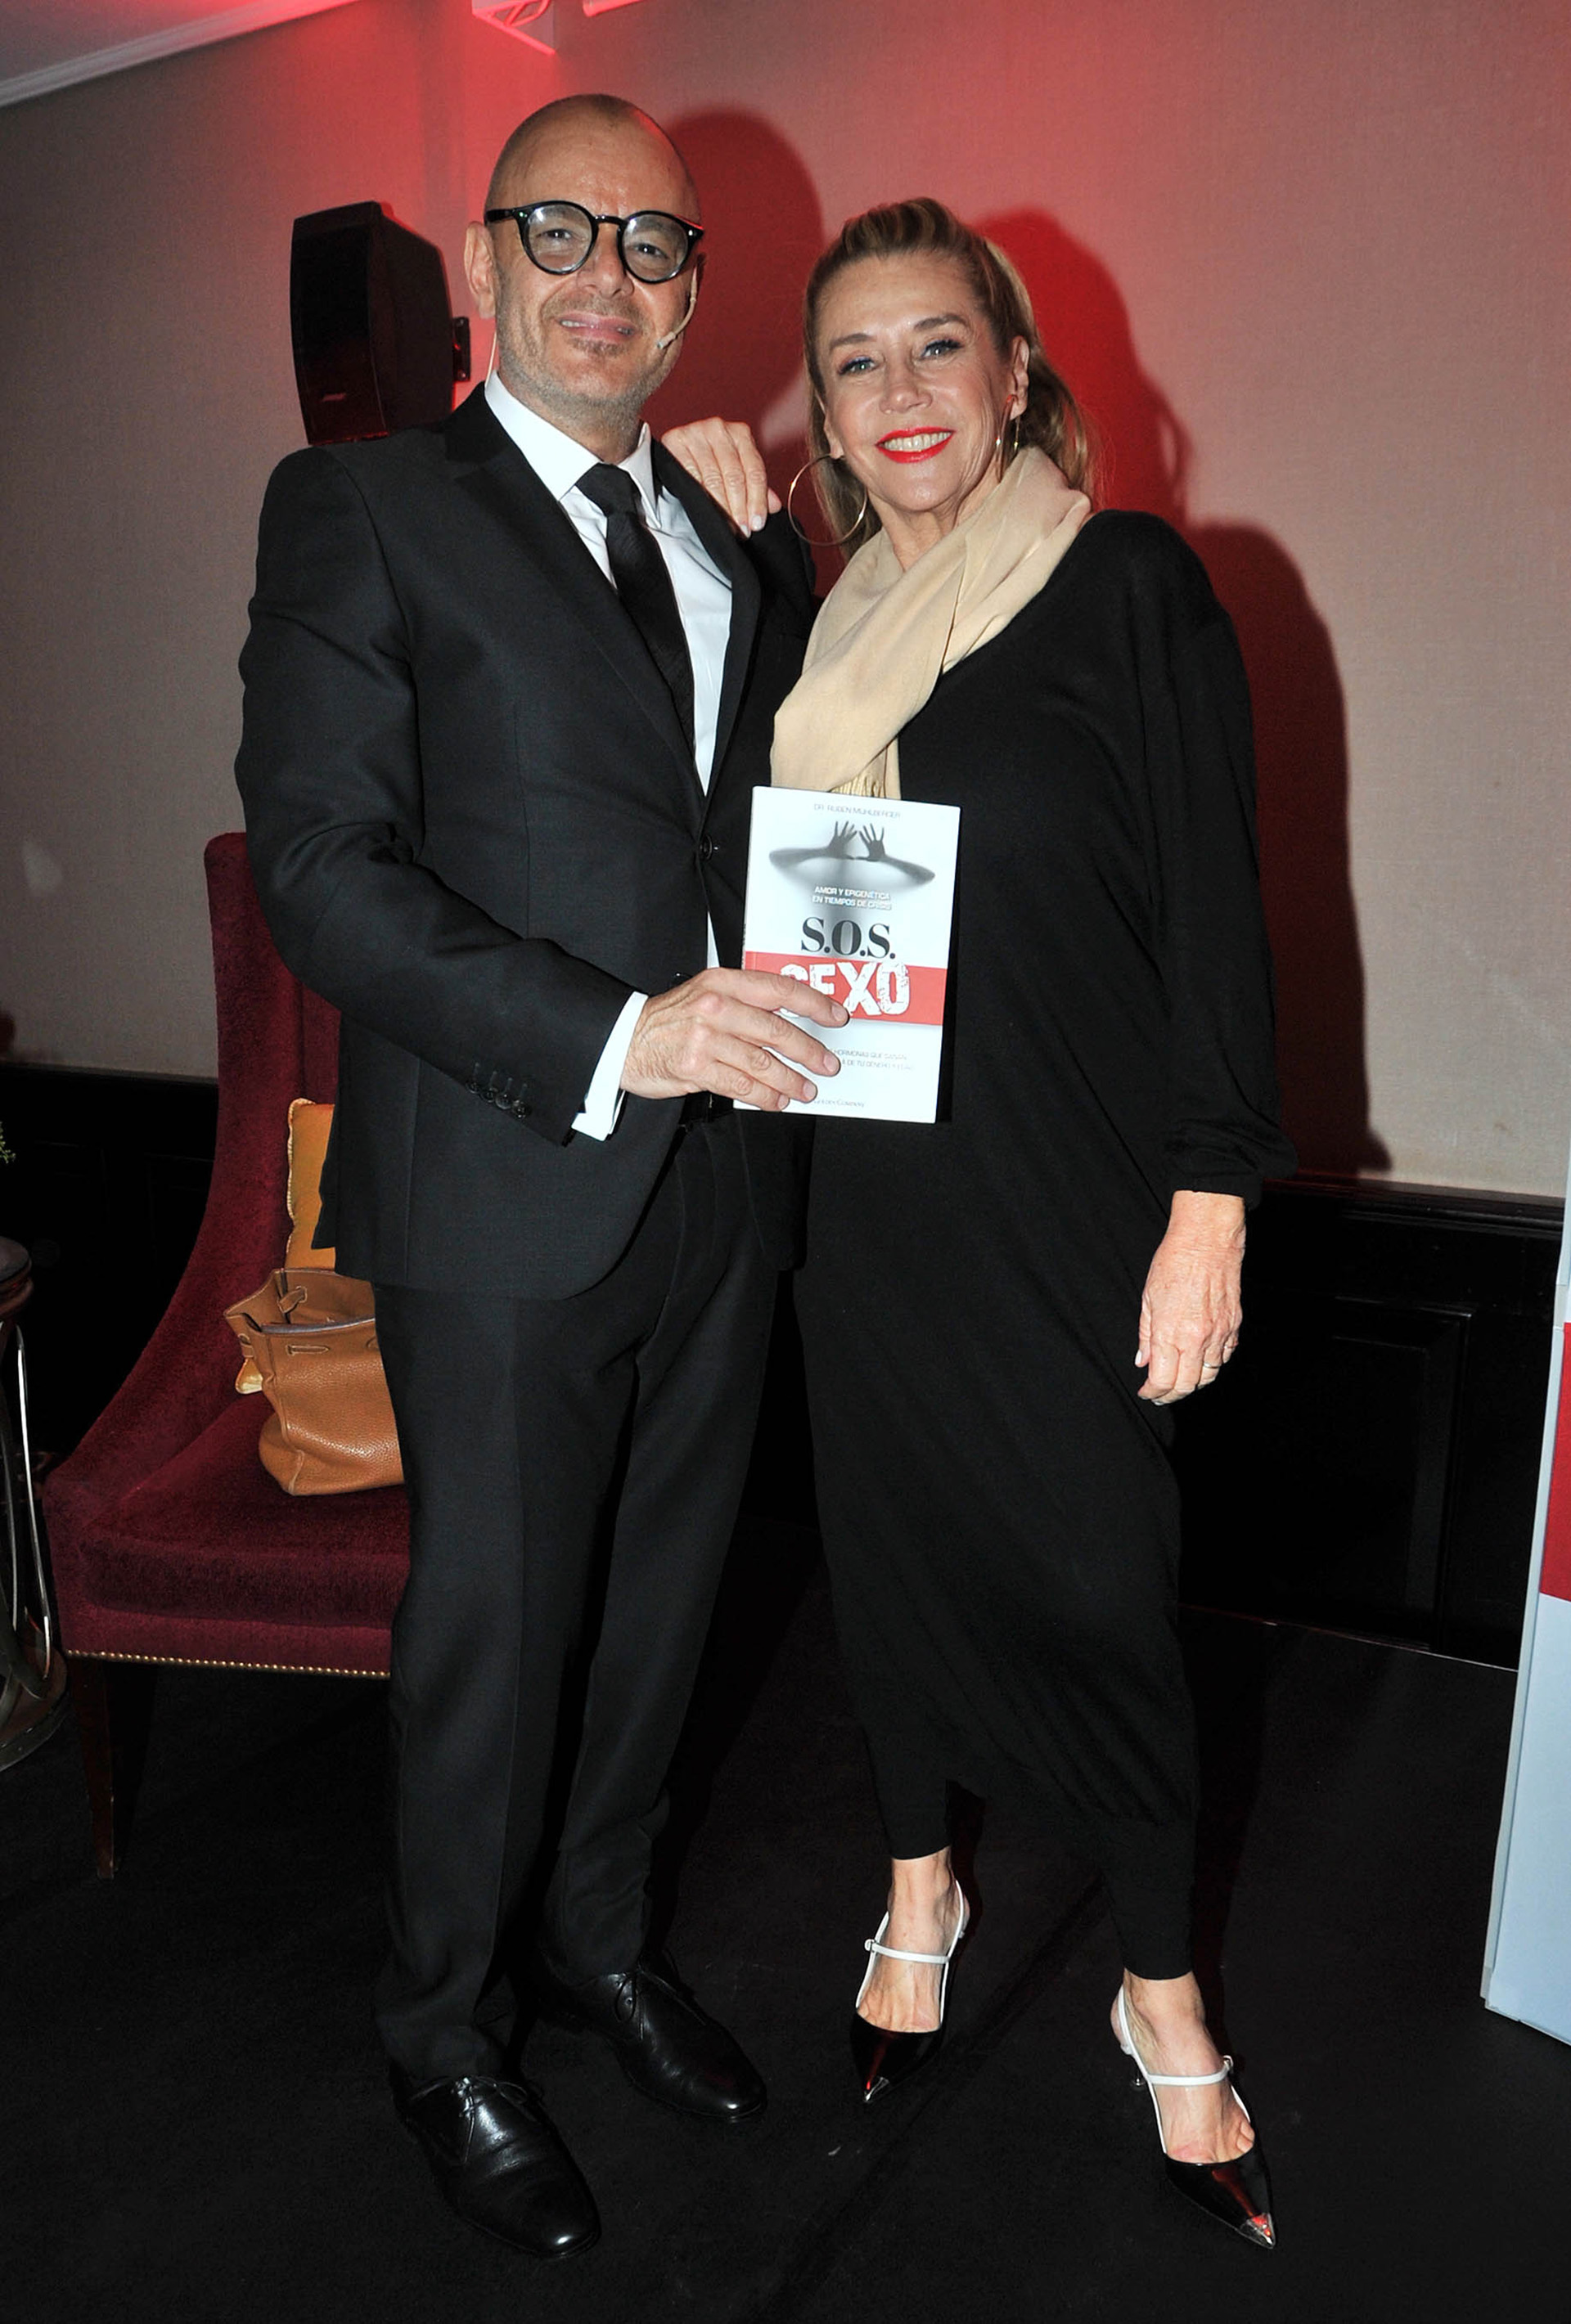 El doctor Mühlberger y Marcela Tinayre